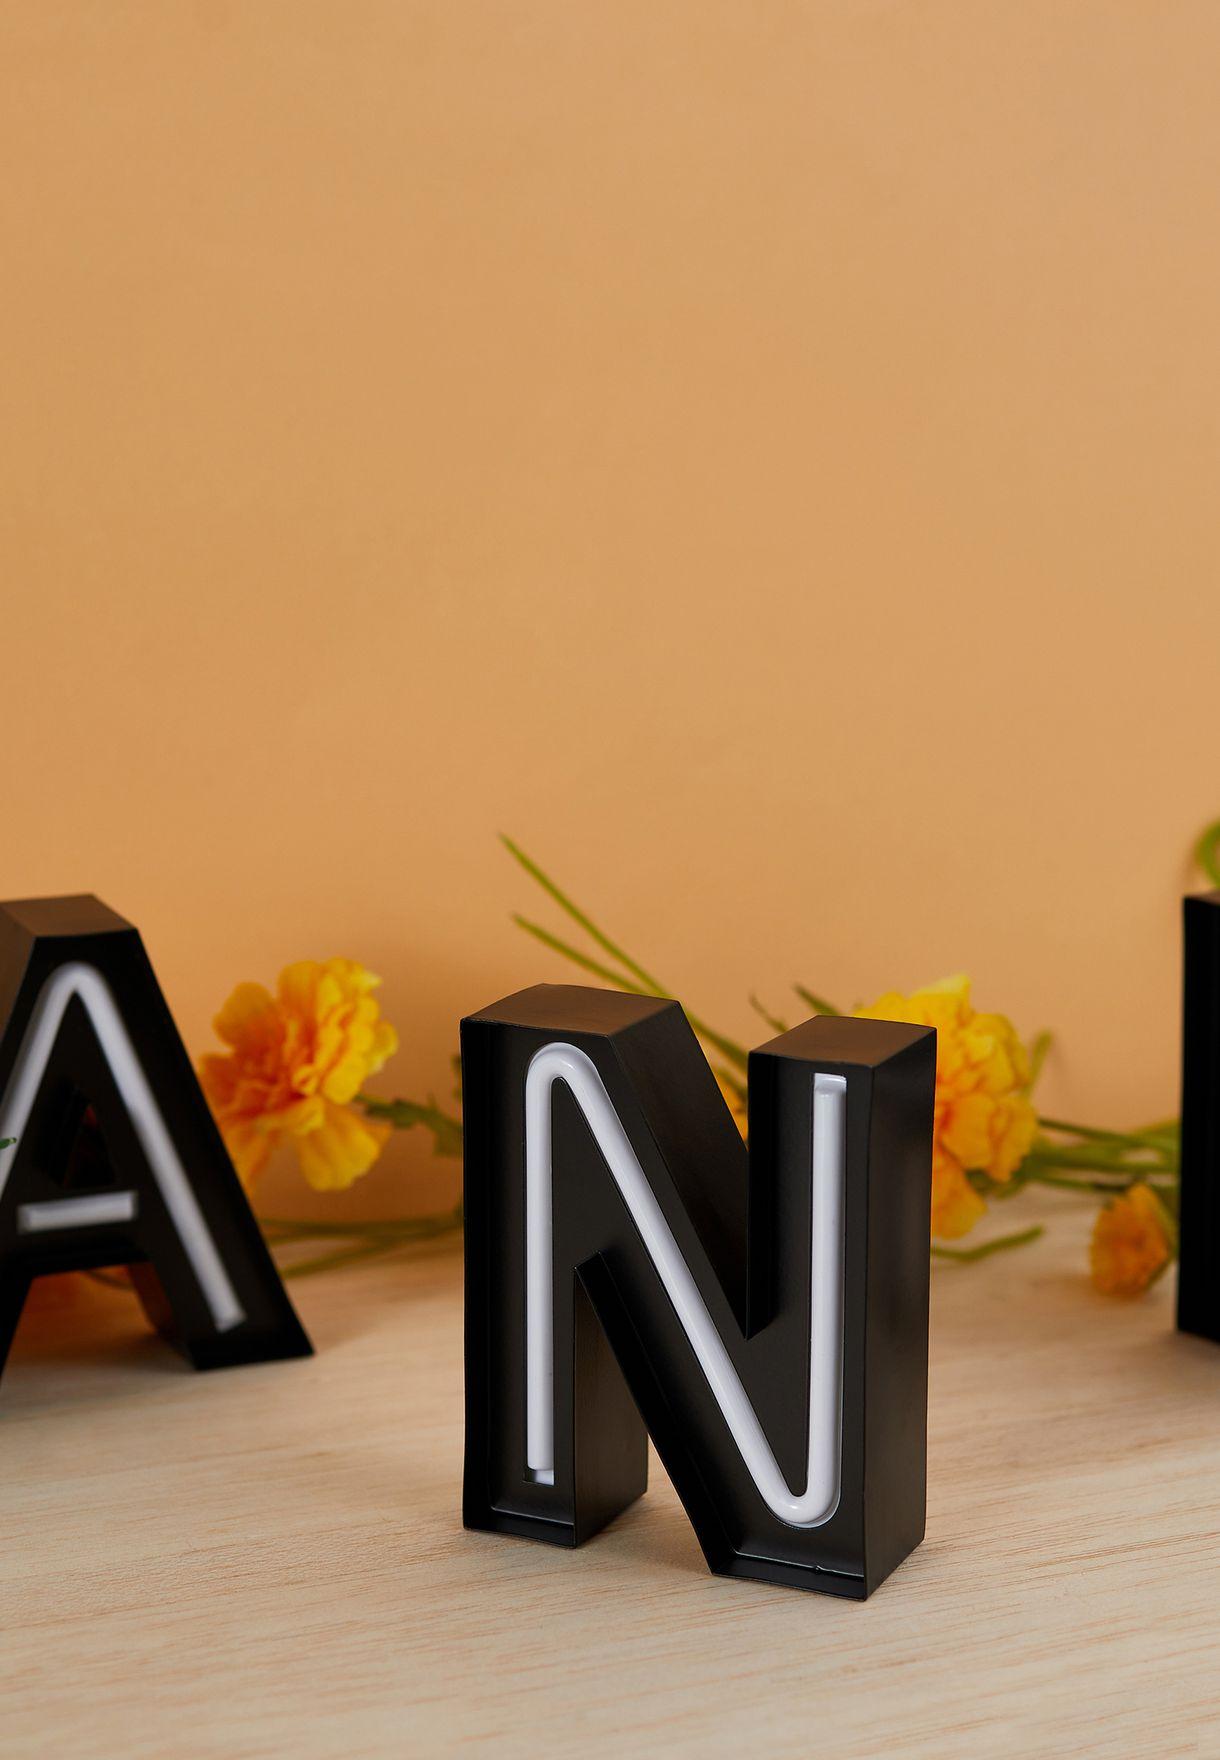 ضوء شكل حرف N